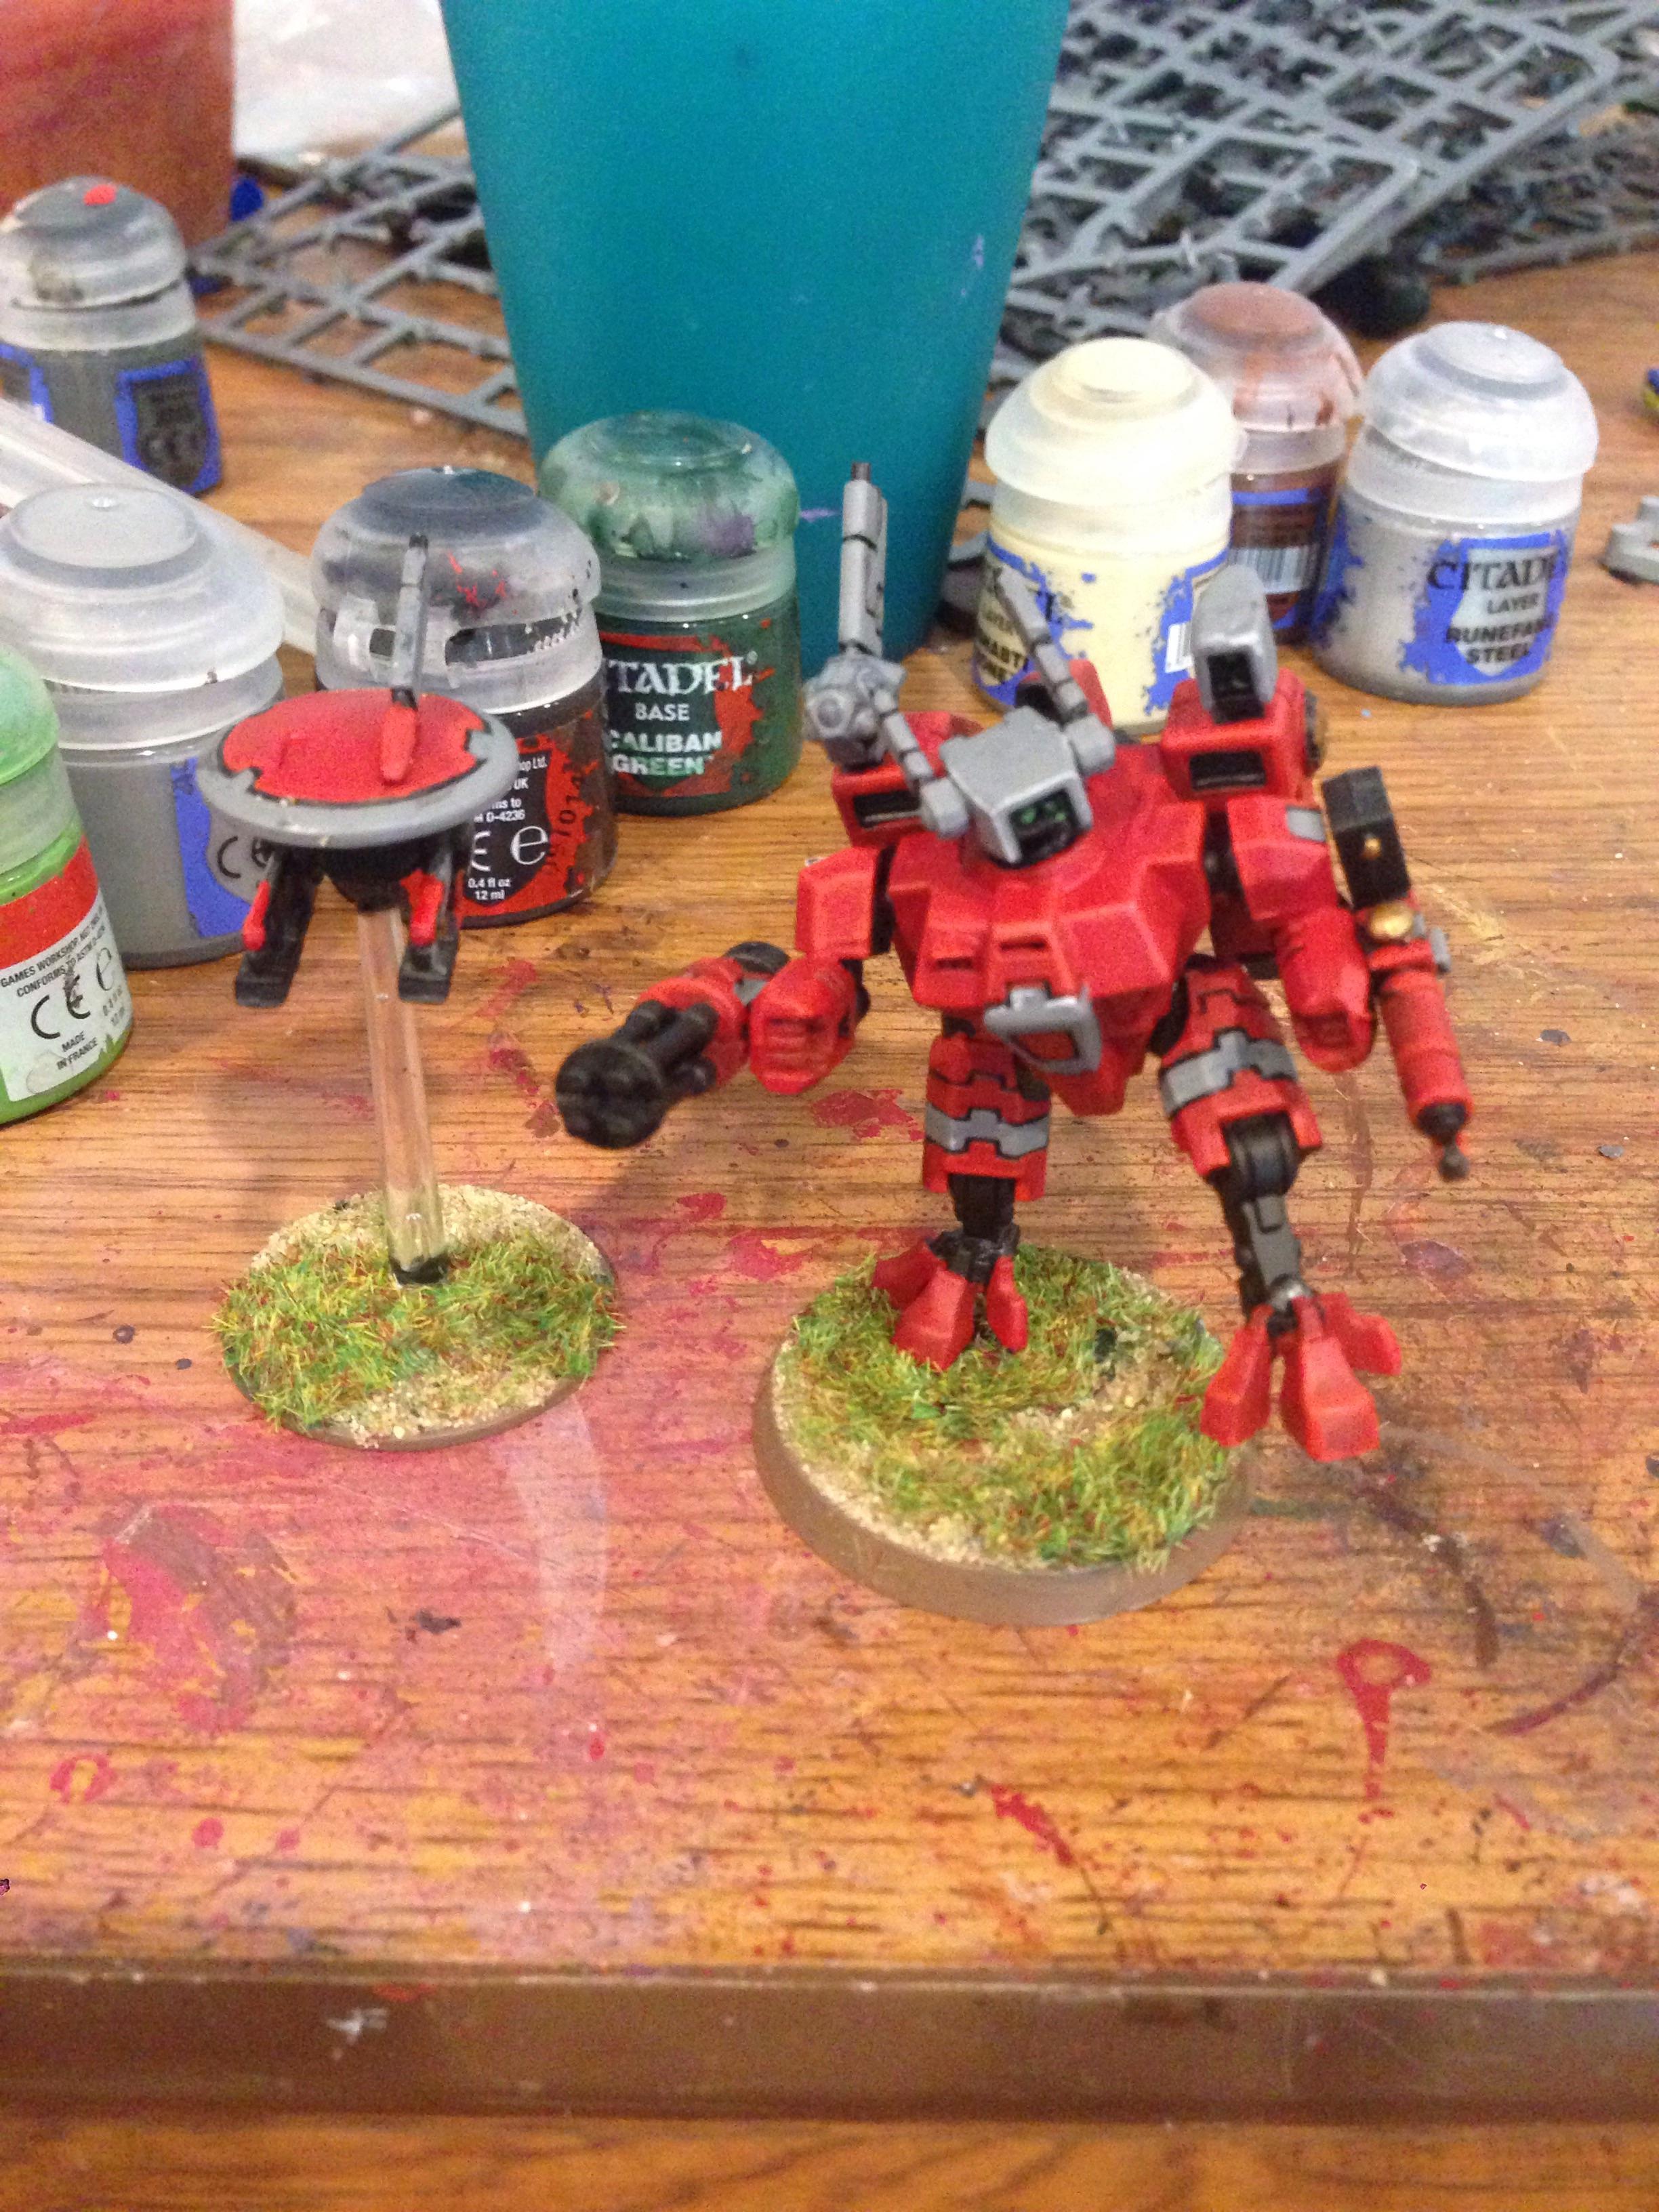 Amry, Commander, Drone, Gun, Tau, Warhammer 40,000, Work In Progress, Xv-8